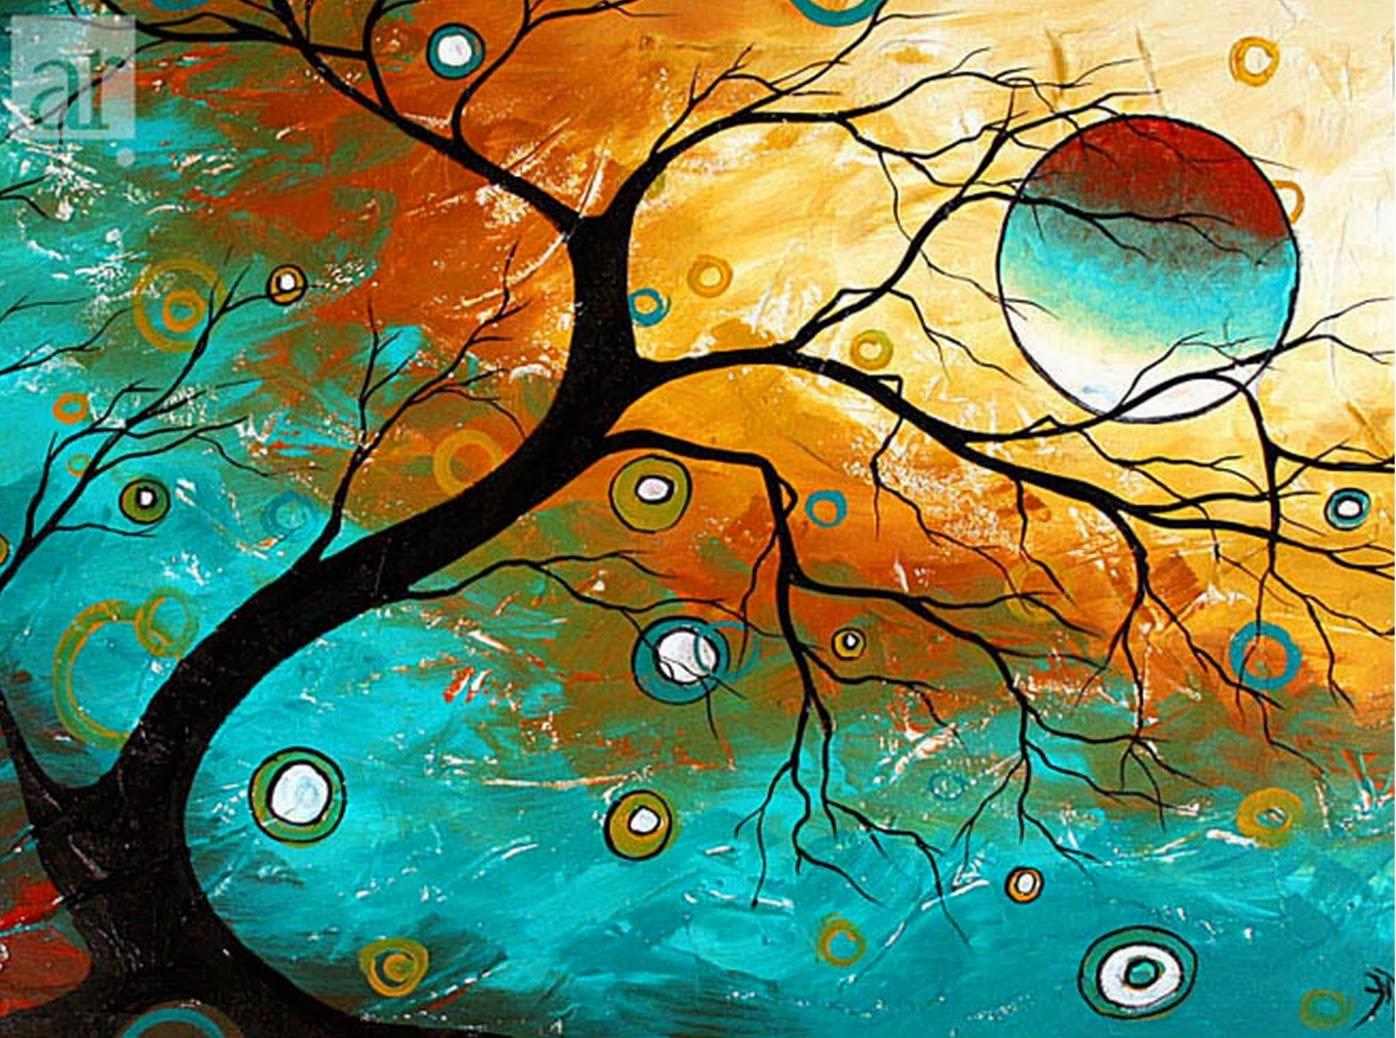 Cuadros modernos pinturas y dibujos cuadros modernos - Ideas para pintar cuadros ...